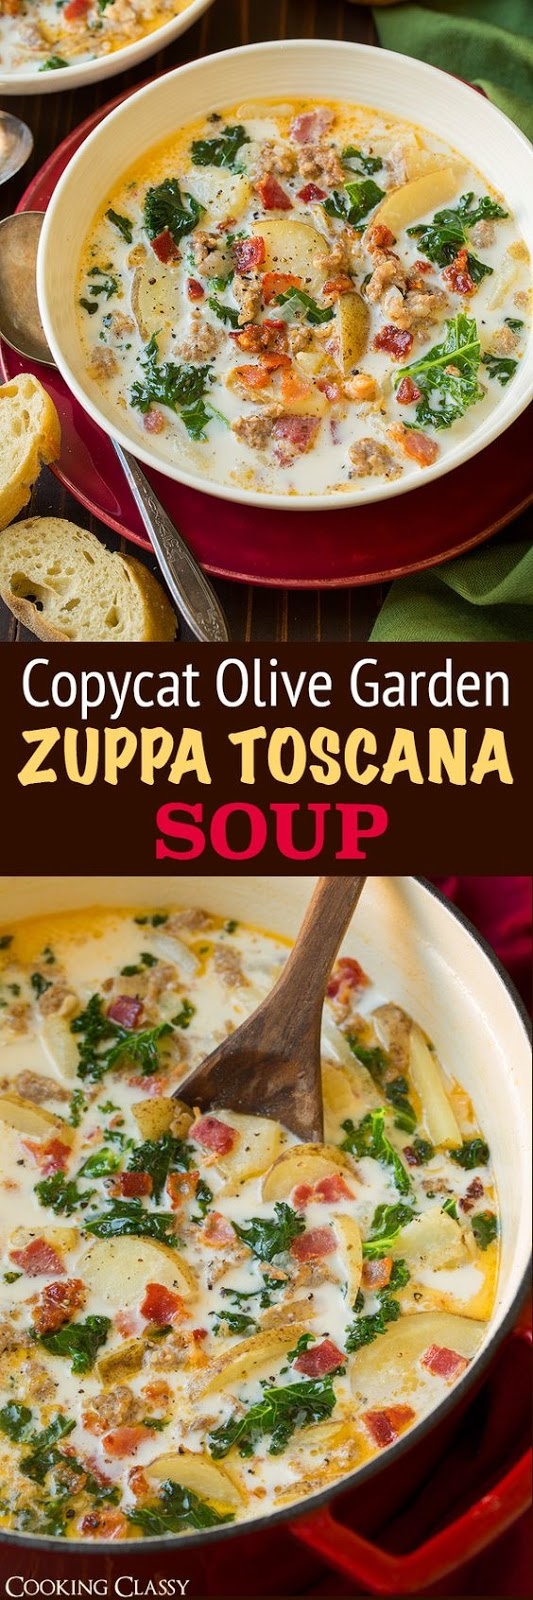 Zuppa toscana soup olive garden copycat cucina de yung for Zuppa toscana soup olive garden recipe